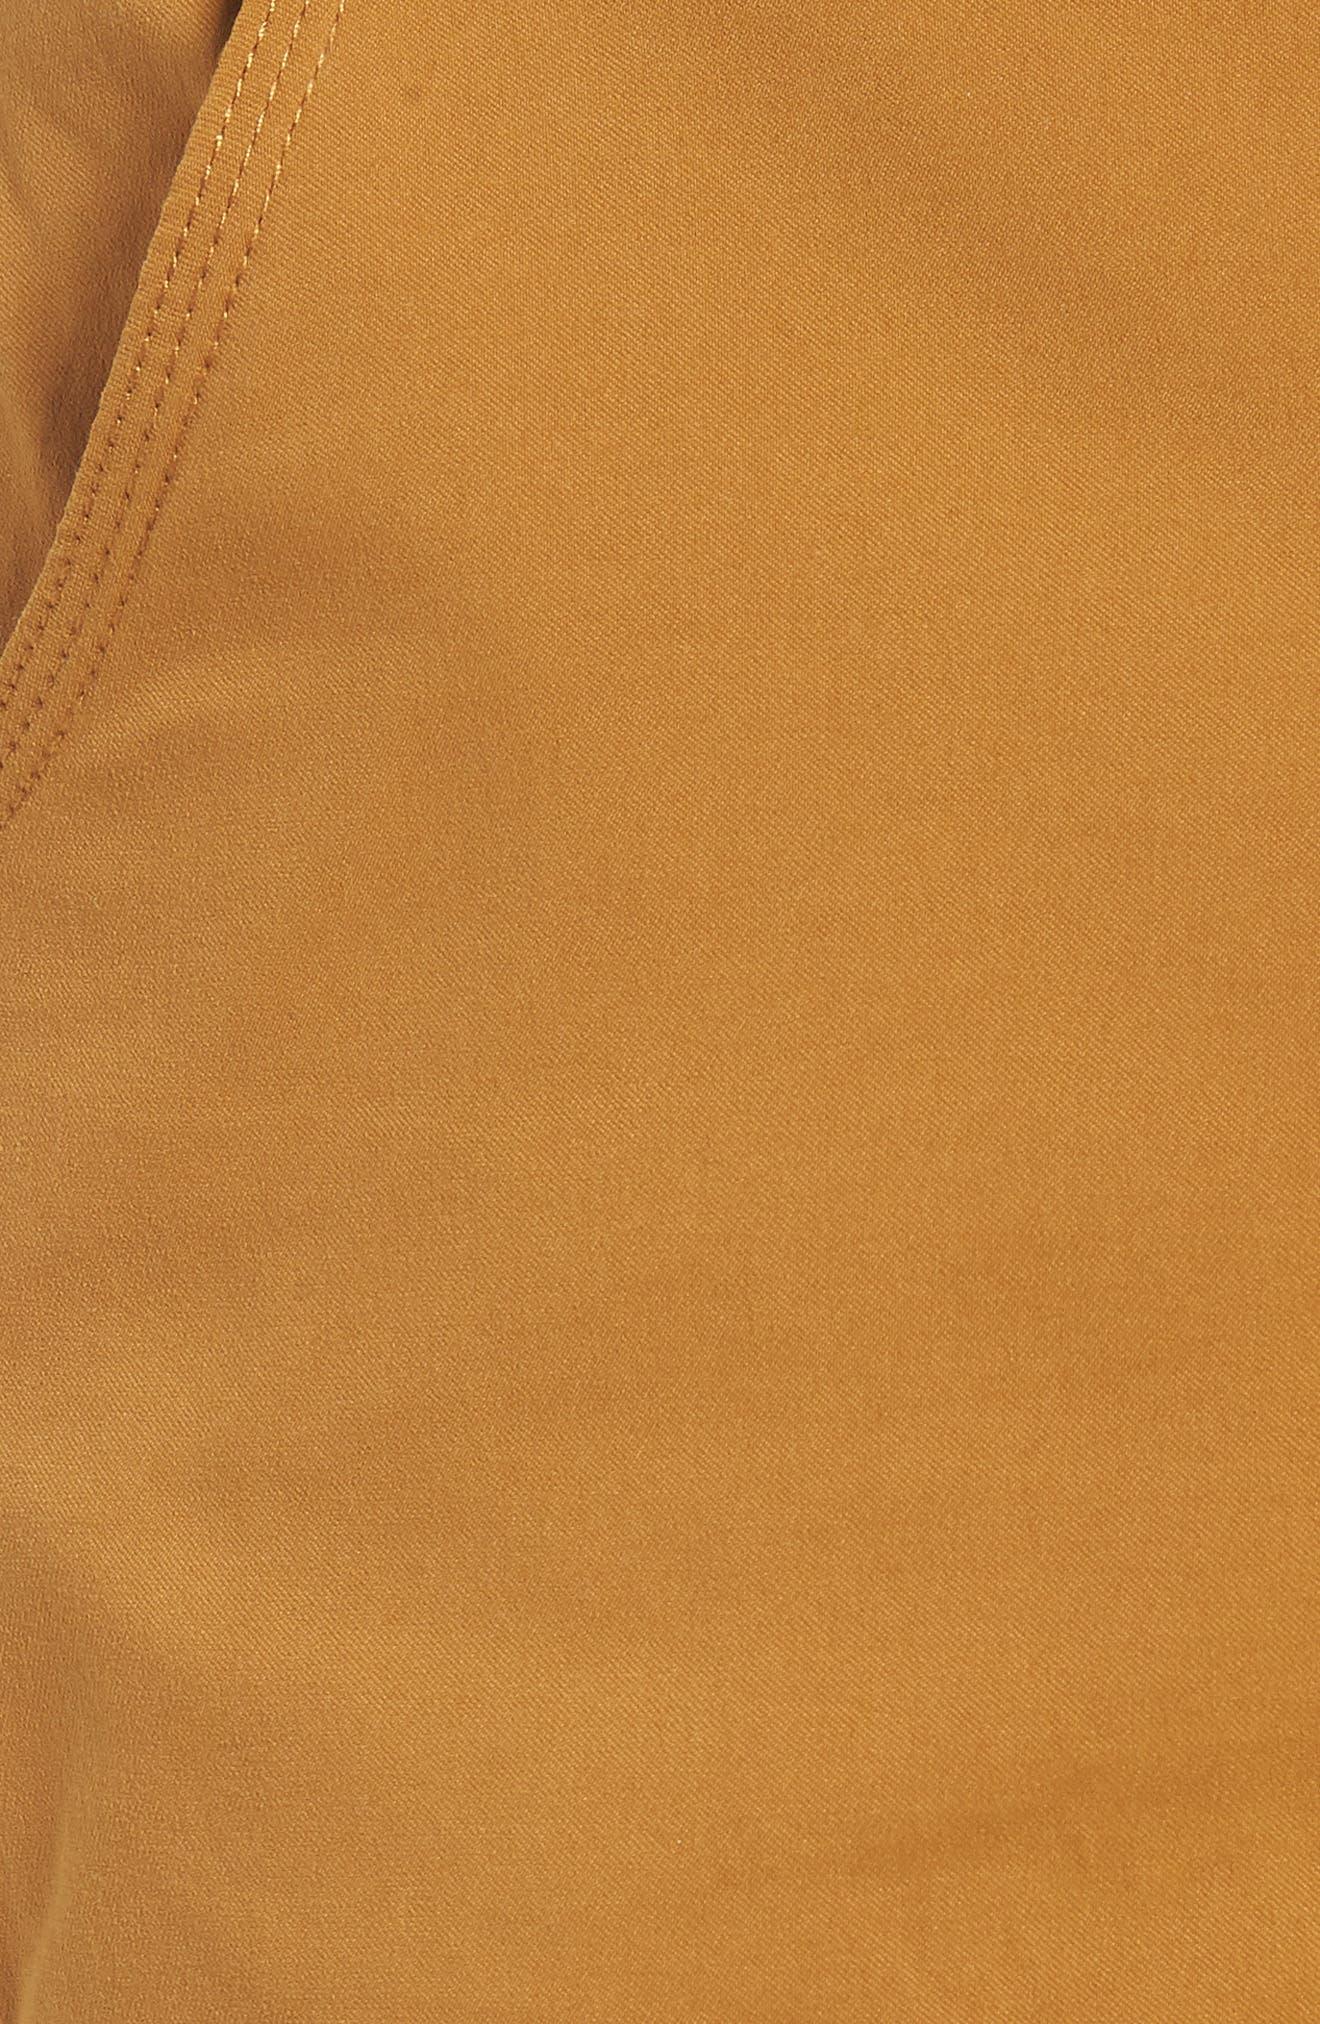 PRANA,                             Zion Stretch Shorts,                             Alternate thumbnail 5, color,                             BRONZED